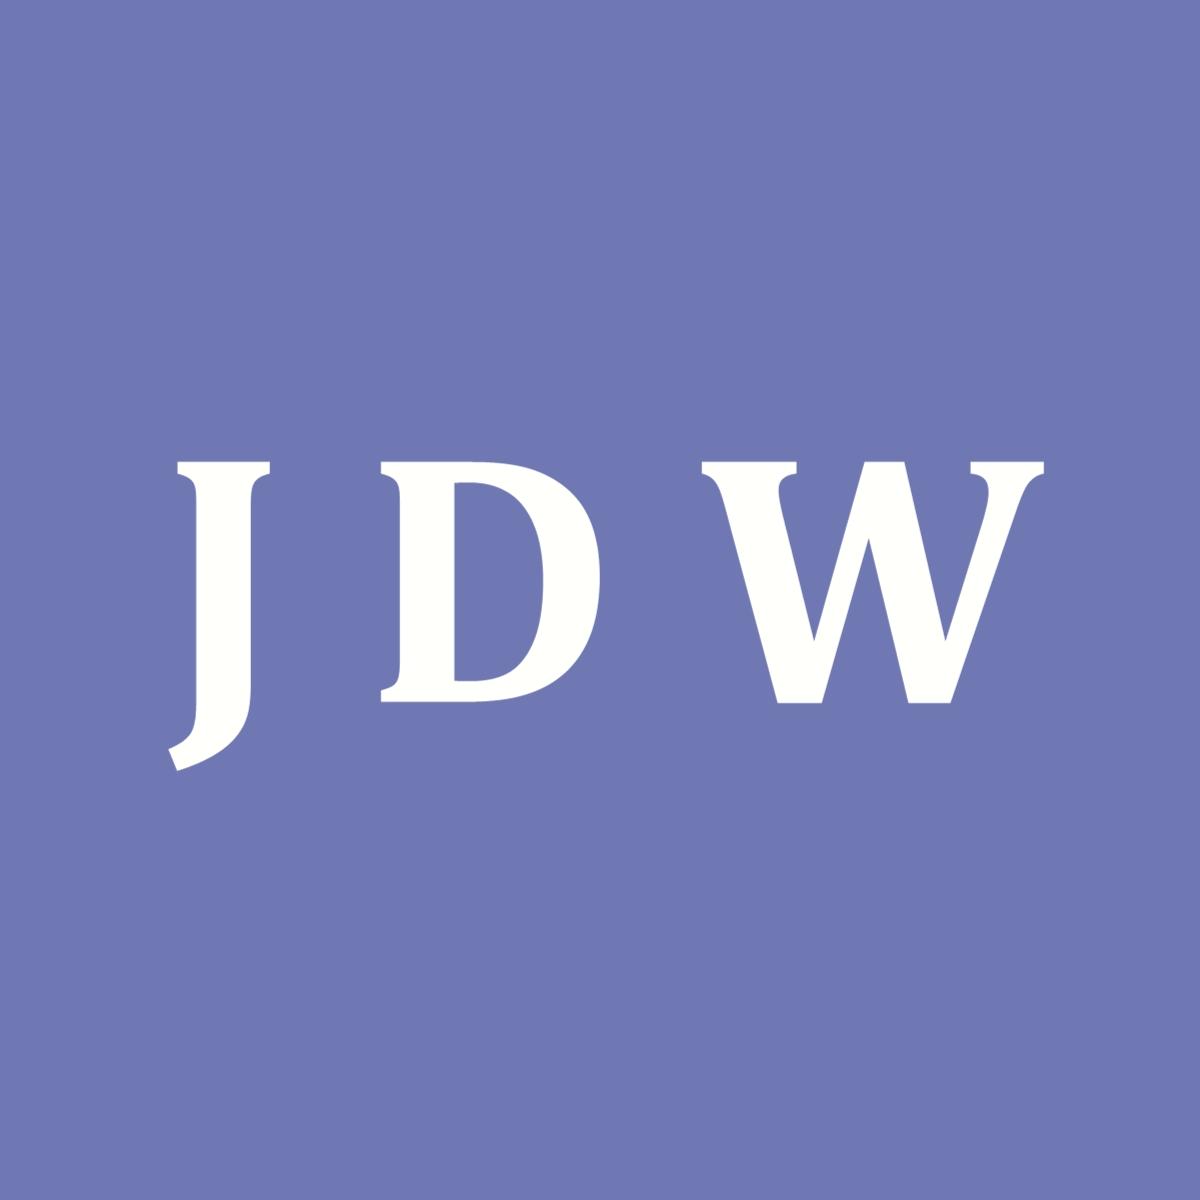 Jdw logo